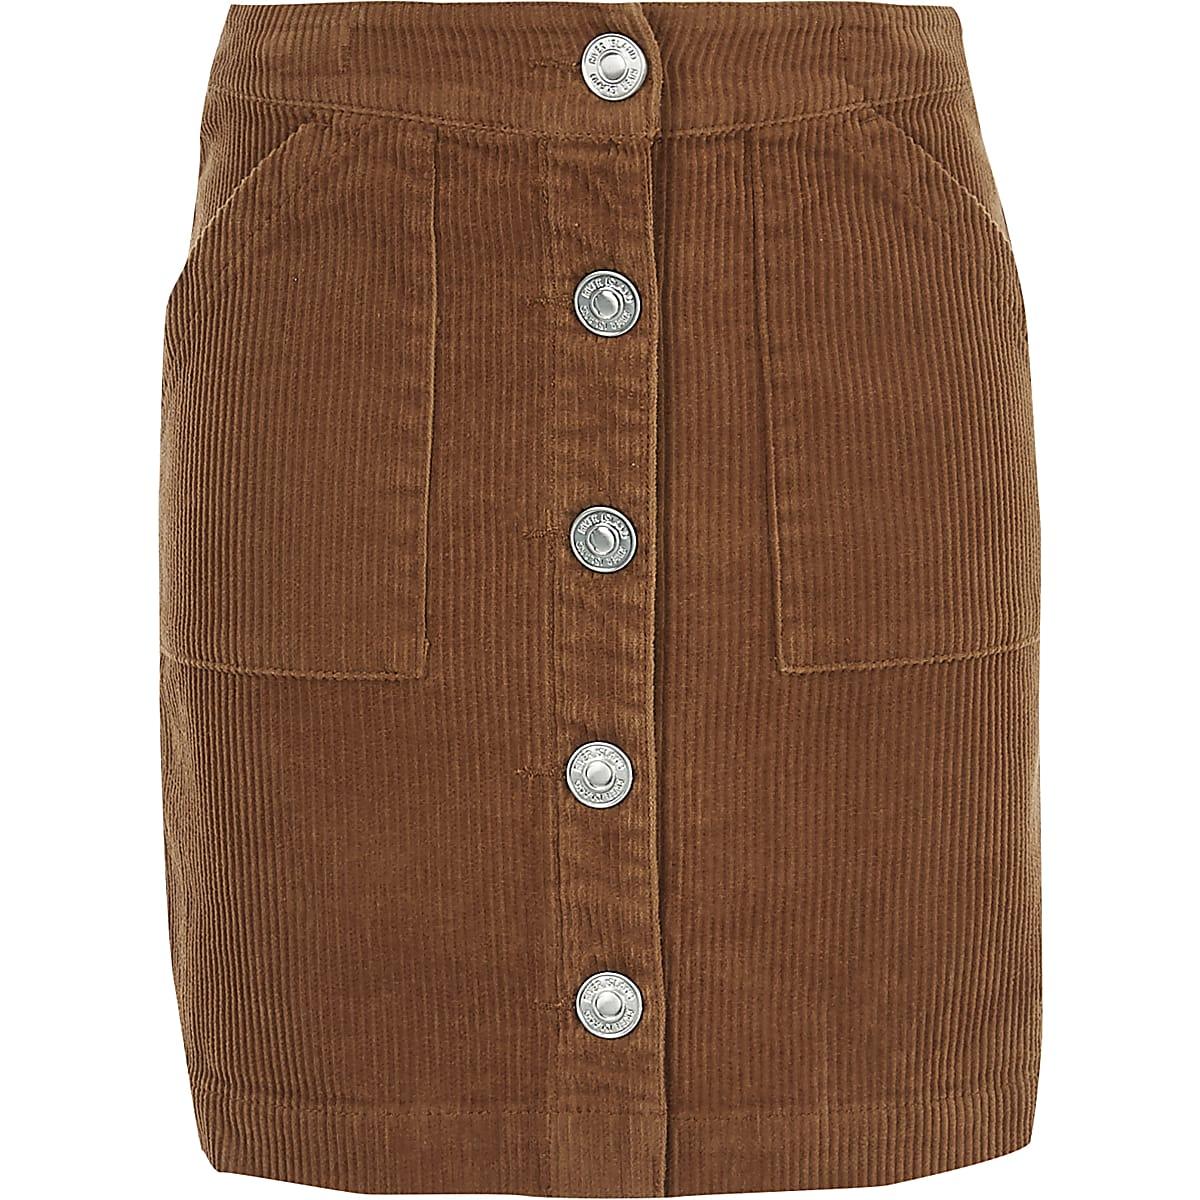 Girls brown cord A line skirt